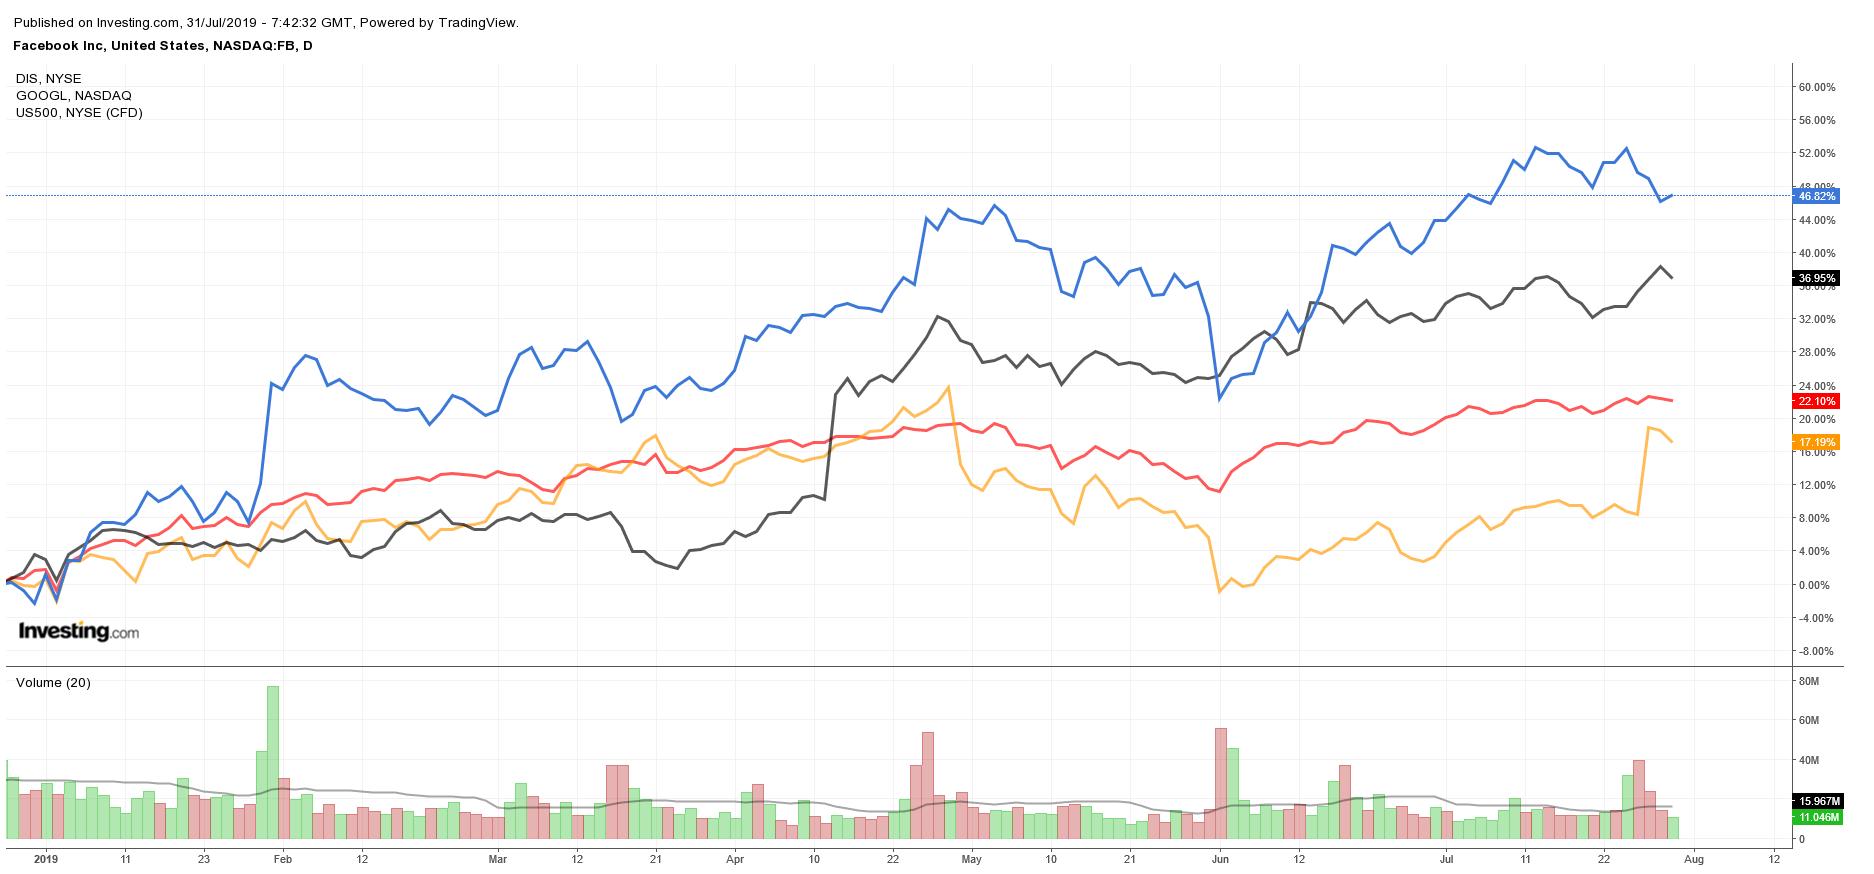 $FB $DIS $GOOGL vs. S&P 500 YTD Performance